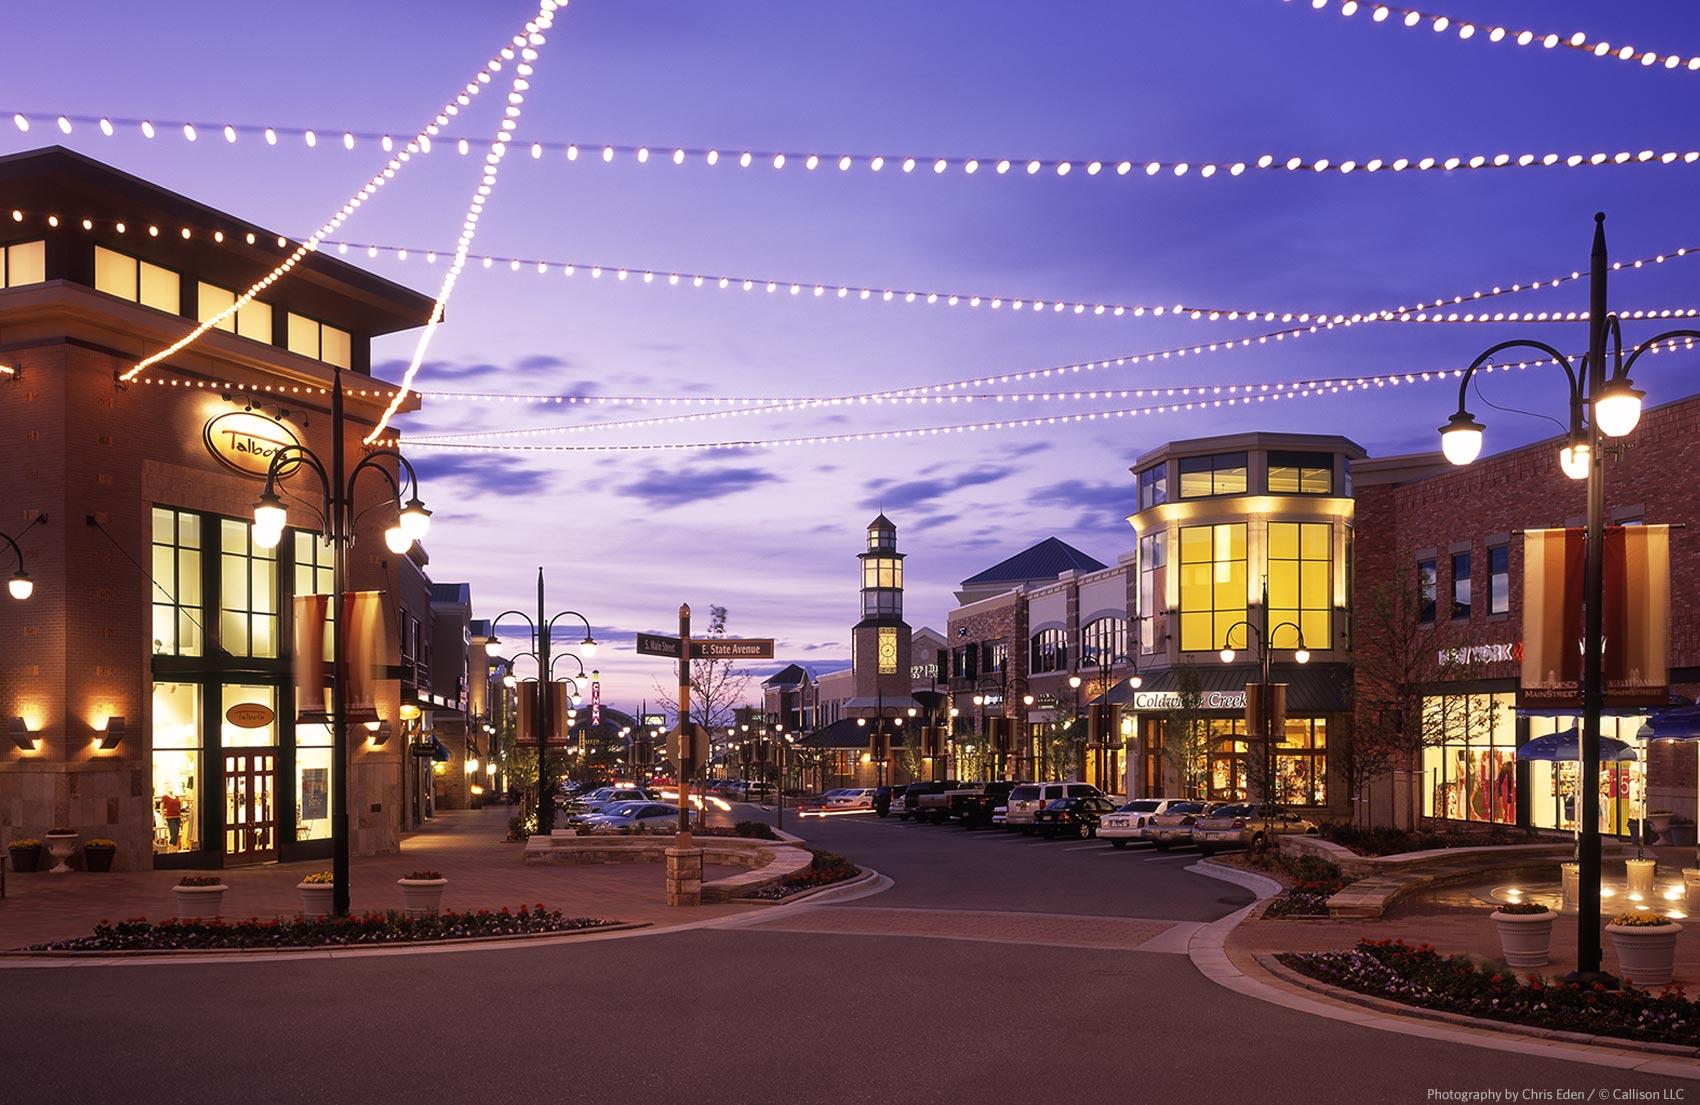 Southlands Center - Exterior street view